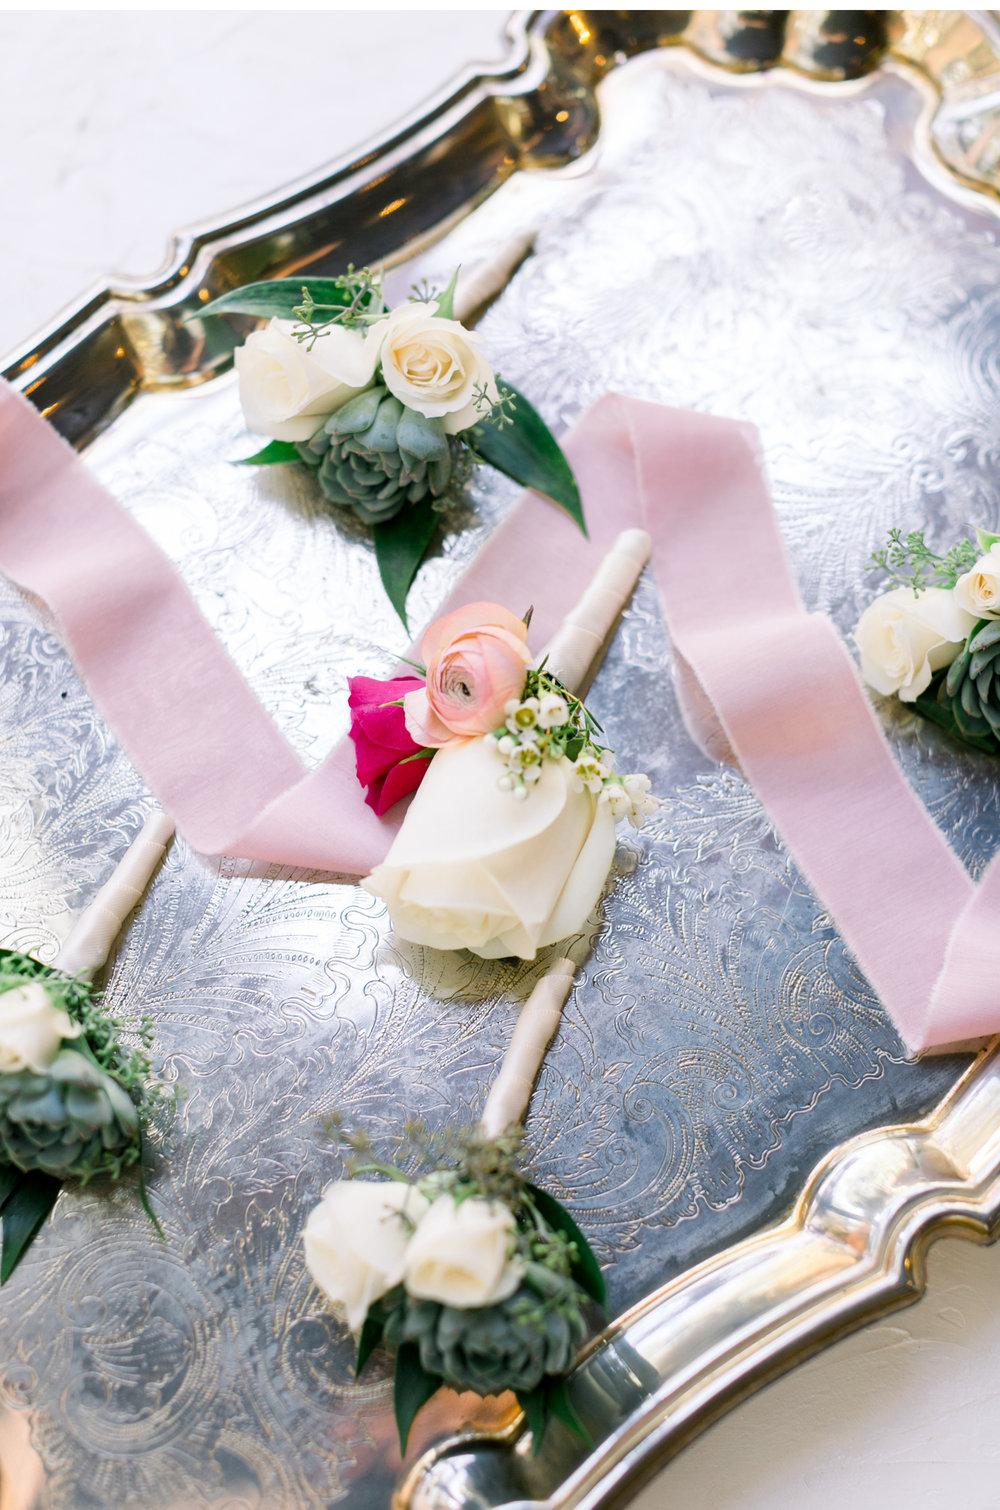 Rancho-Las-Lomas-Wedding-Natalie-Schutt-Photography_02.jpg